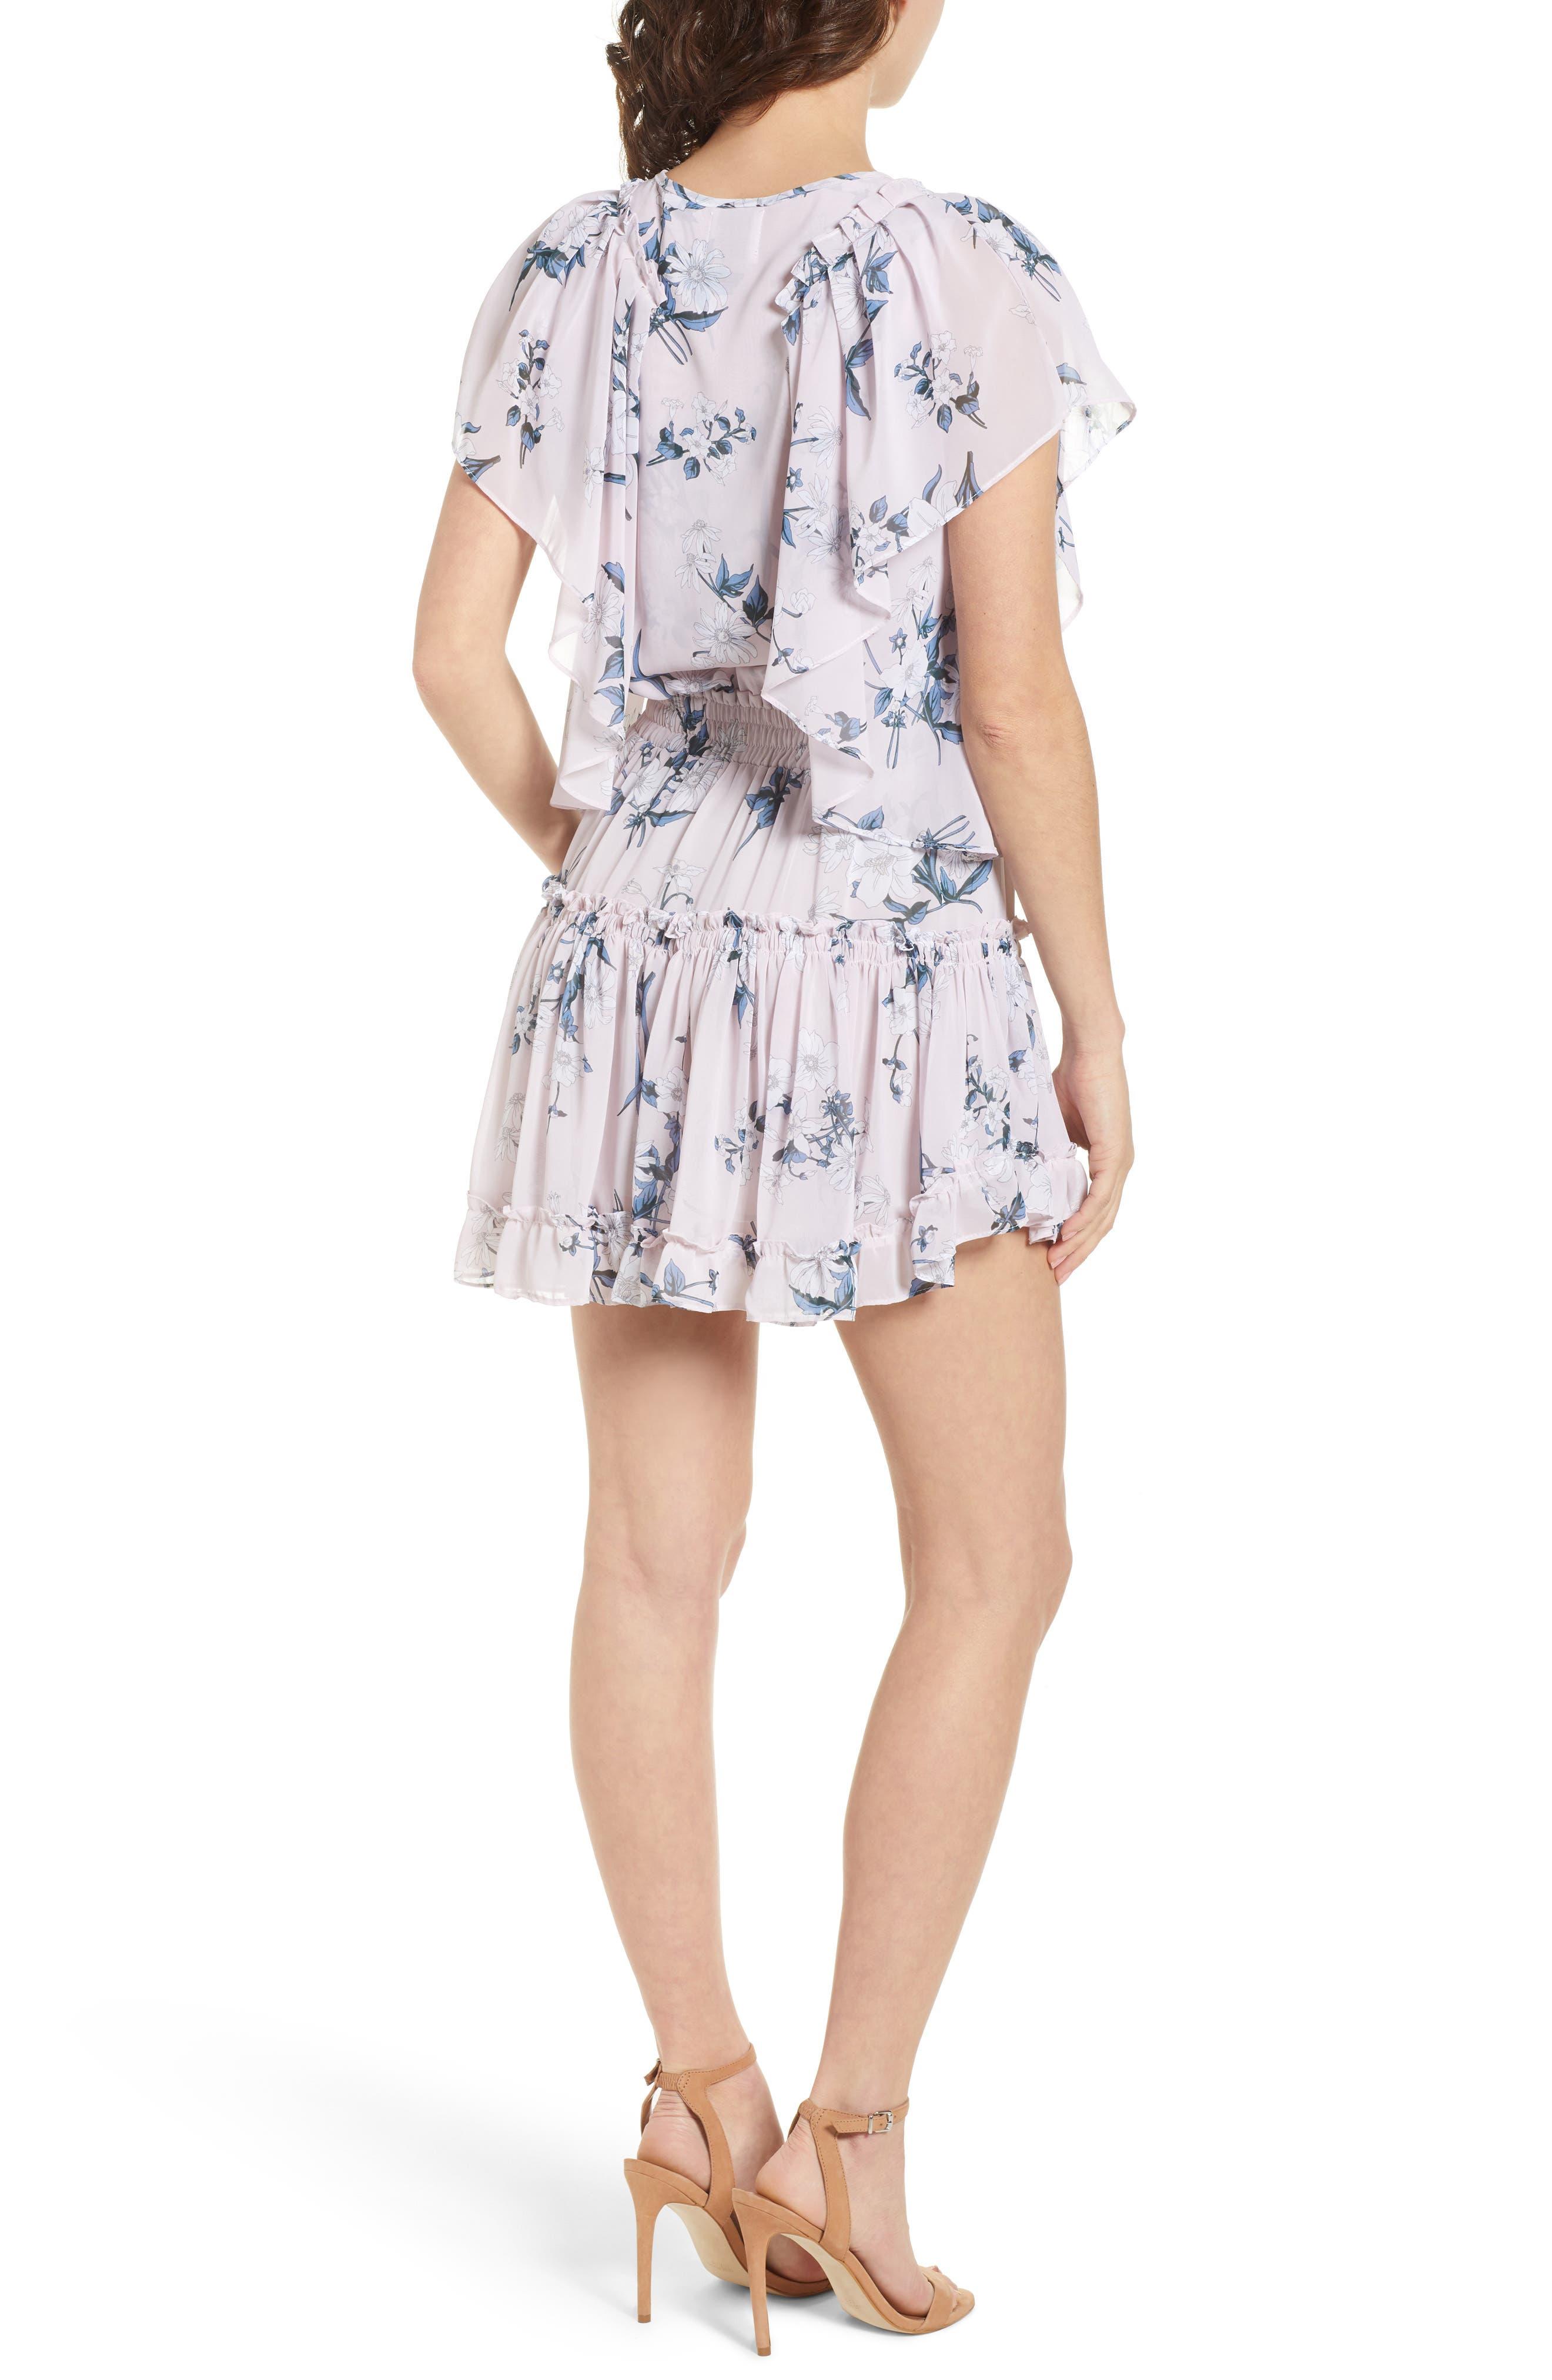 Lullu Dress,                             Alternate thumbnail 2, color,                             650